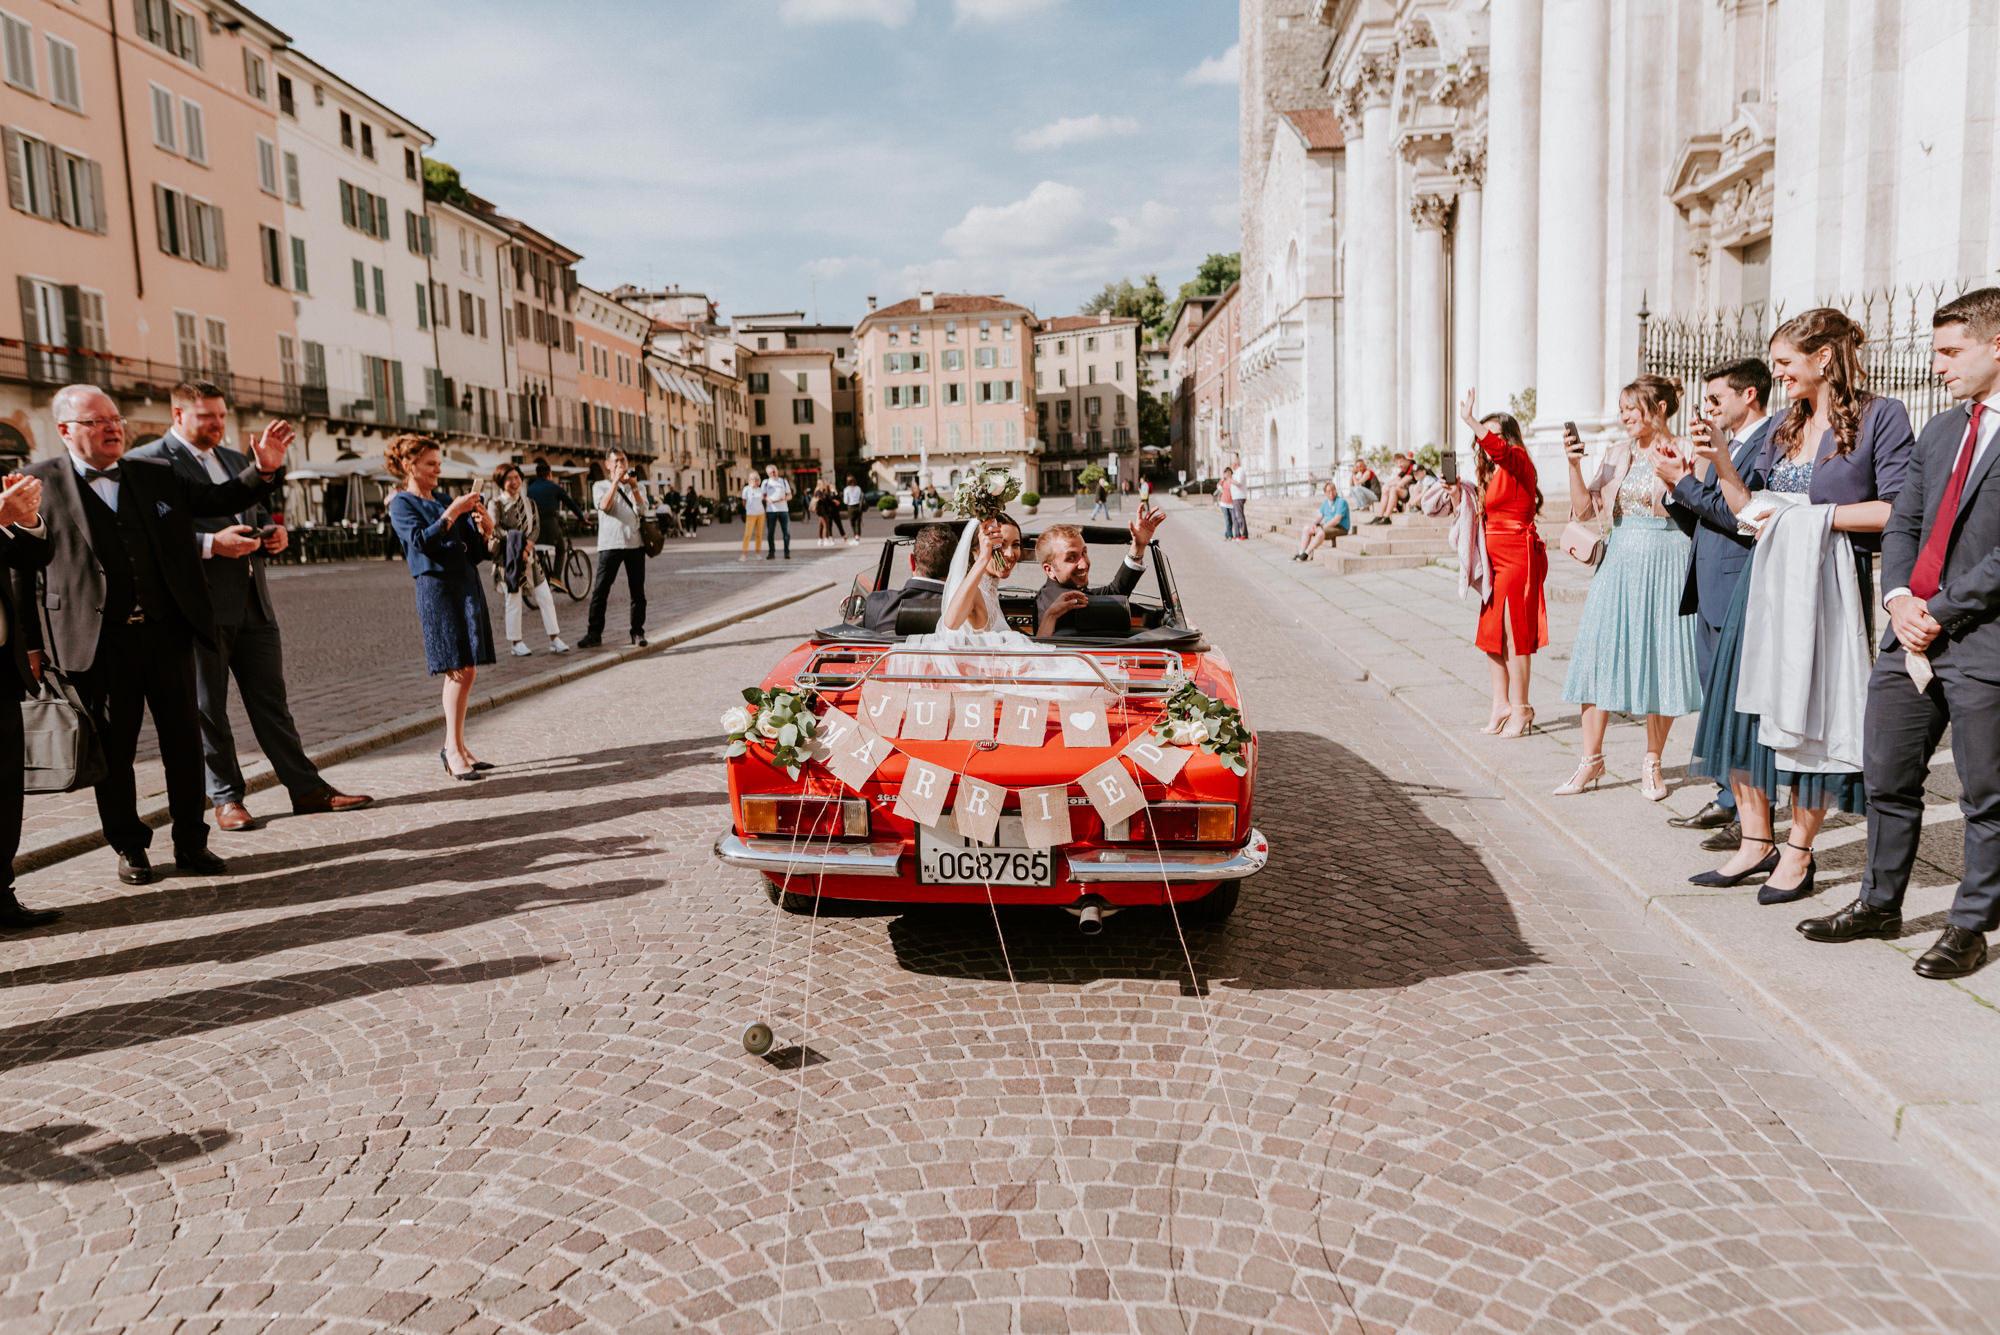 FOTO+PHOTO+BODA+WEDDING+ITALIA+ITALY+MAURICIO+GARAY+MAURICIOGARAY+WEDDINPHOTOGRAPHER+FOTOGRAFODEBODA-1142.jpg